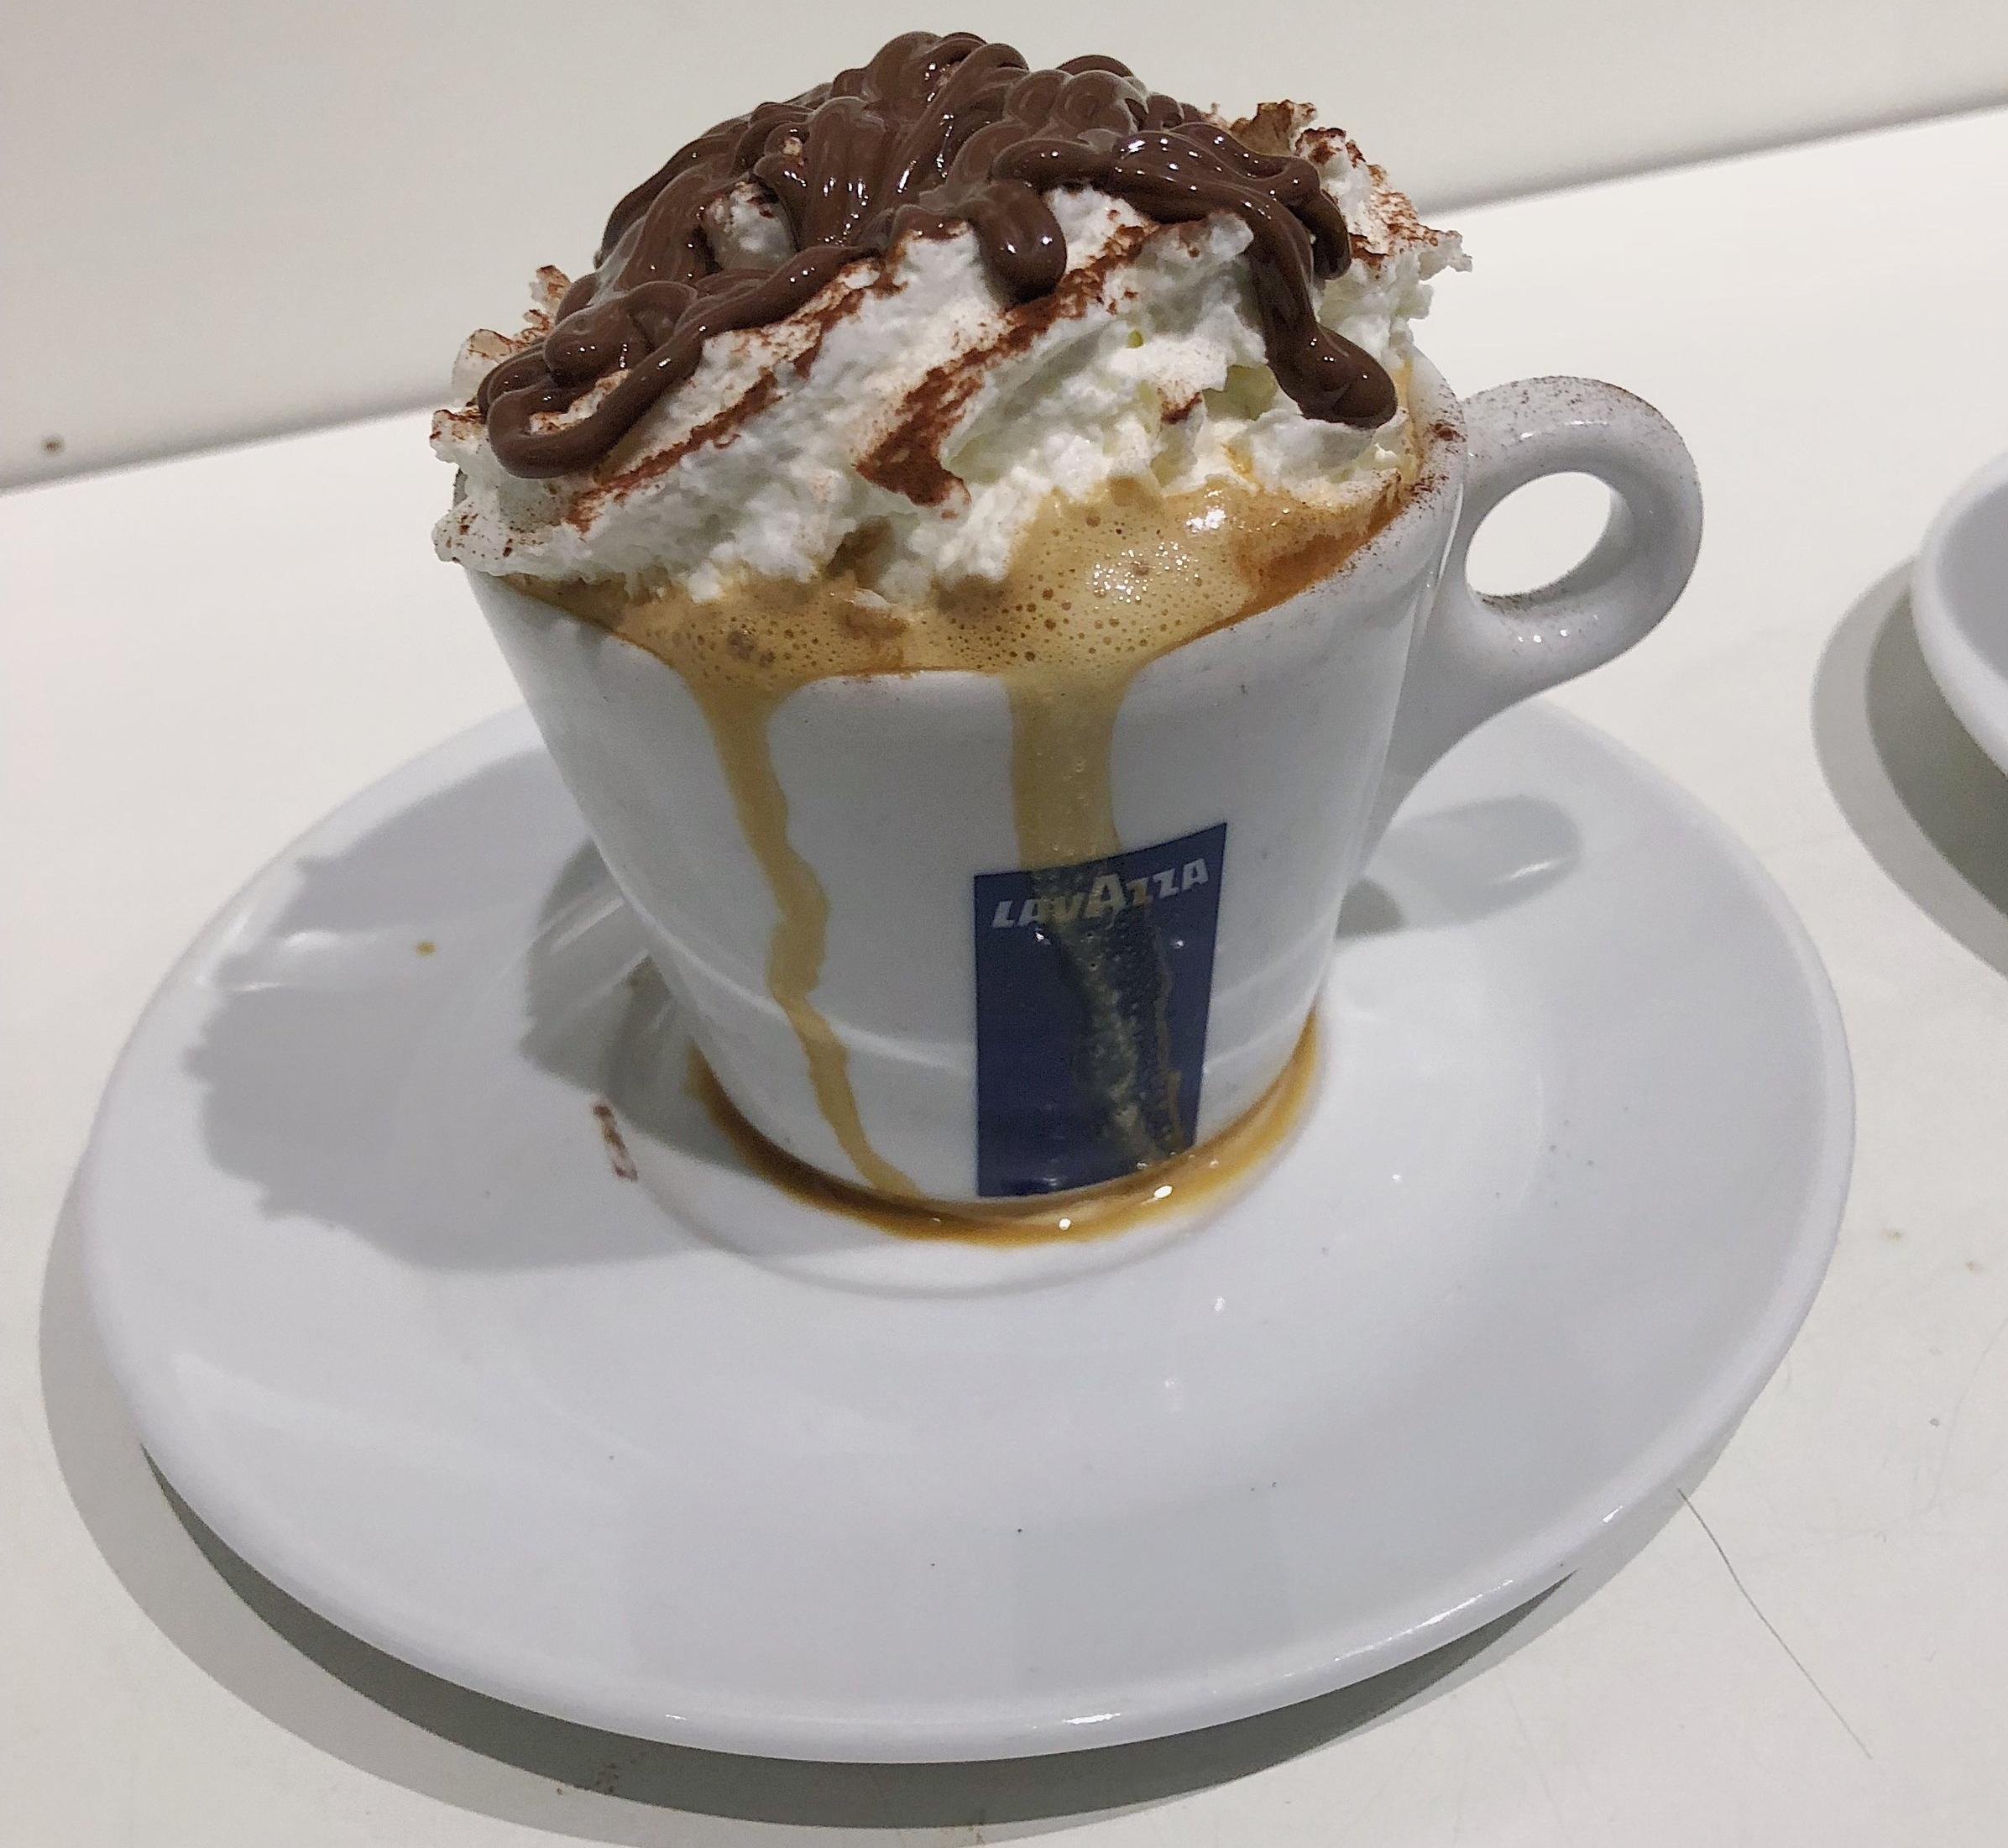 Eataly espresso dribble